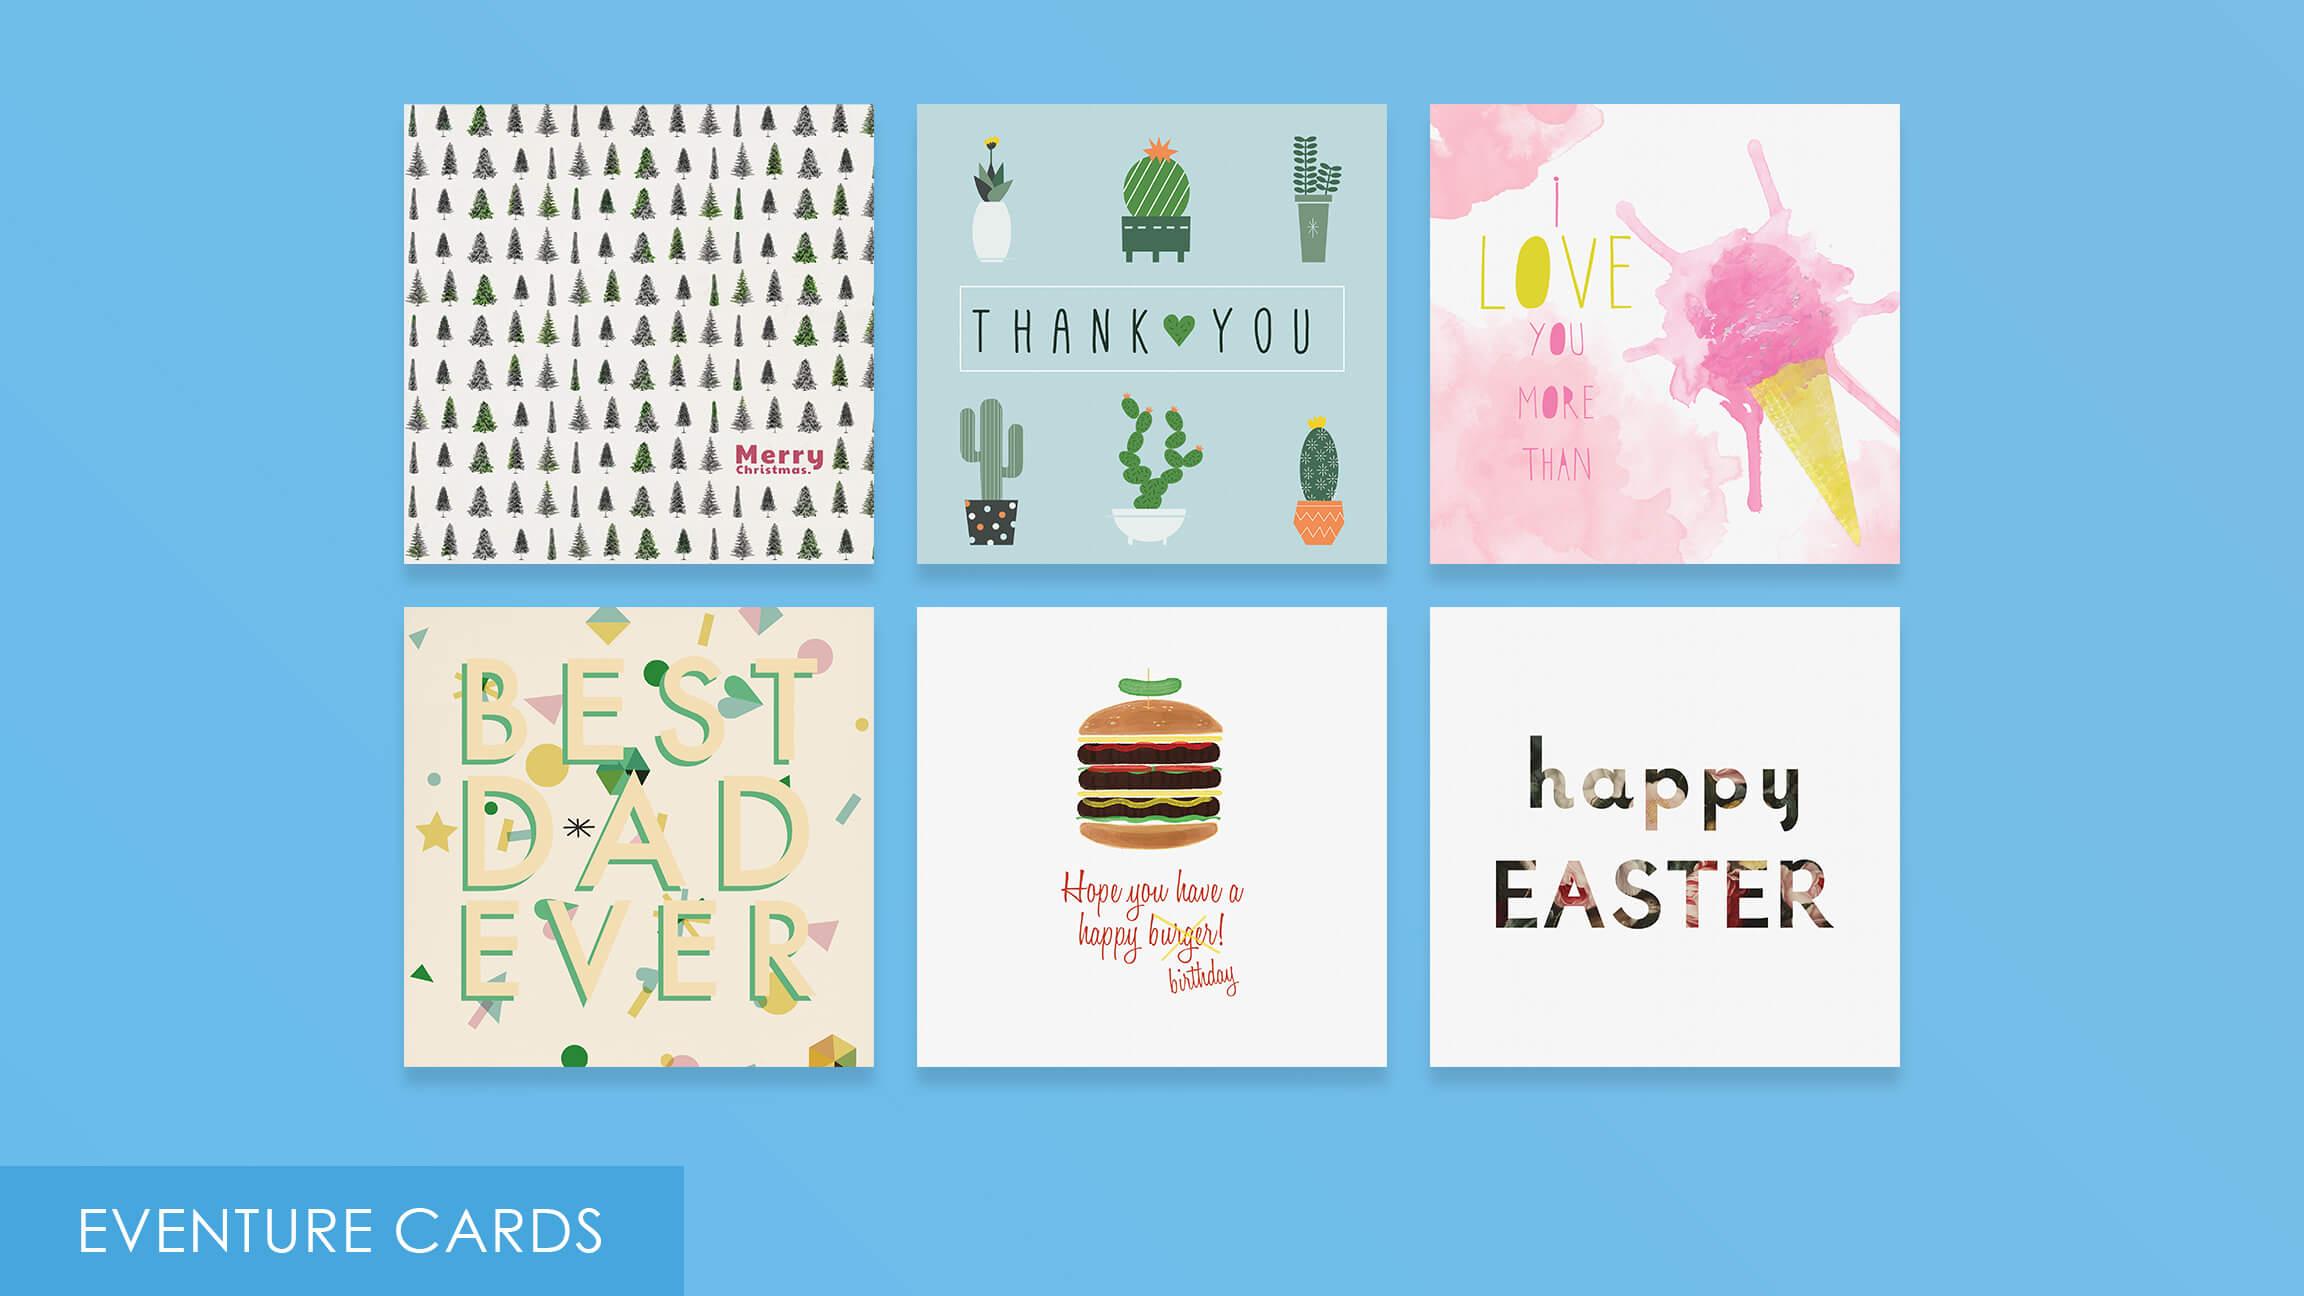 the-four-design-eventure-cards.jpg